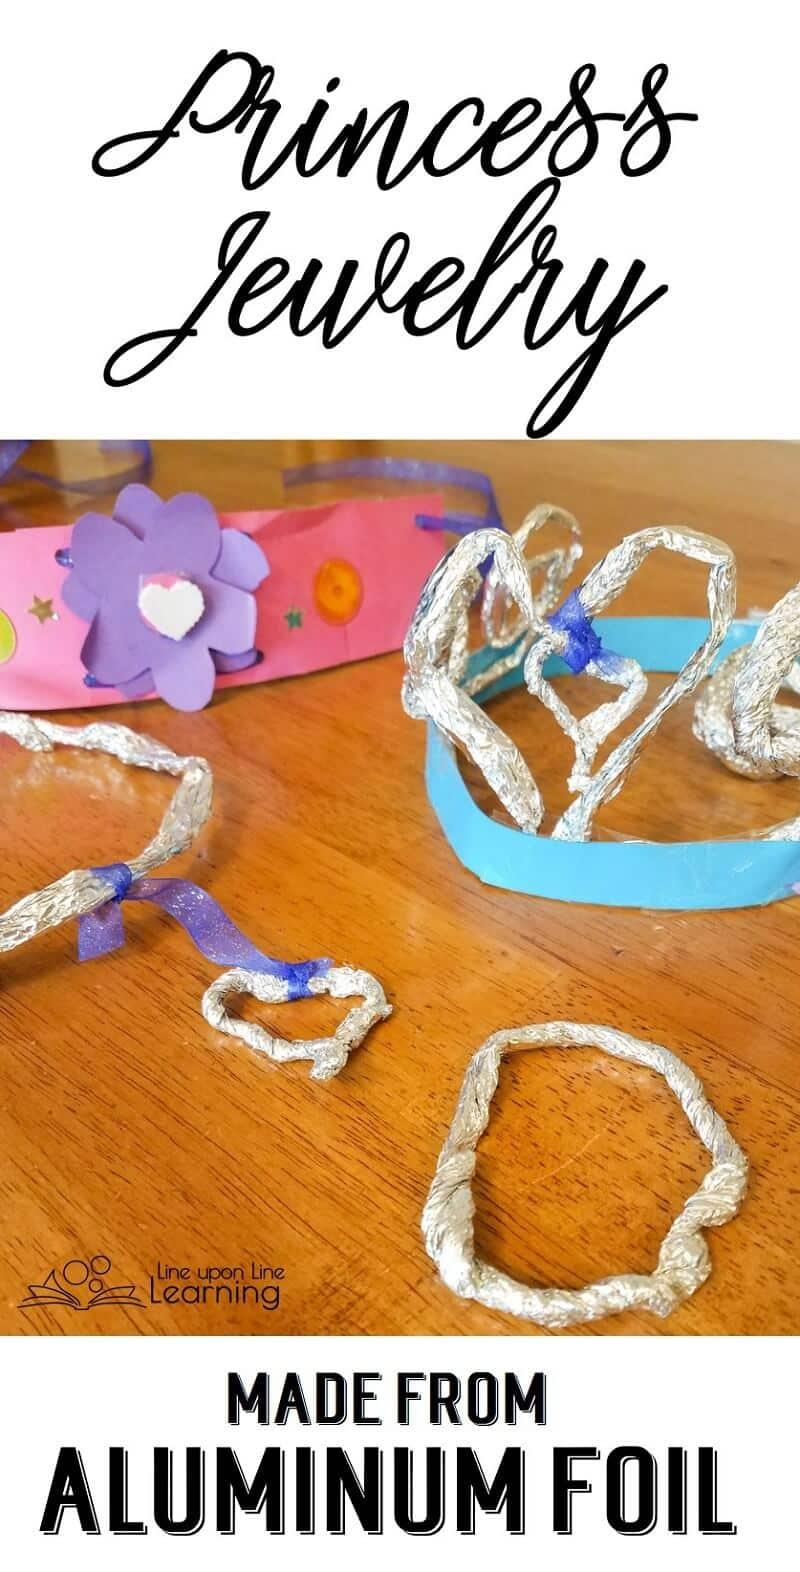 Twist aluminum foil in skinny strips to make princess jewelry.